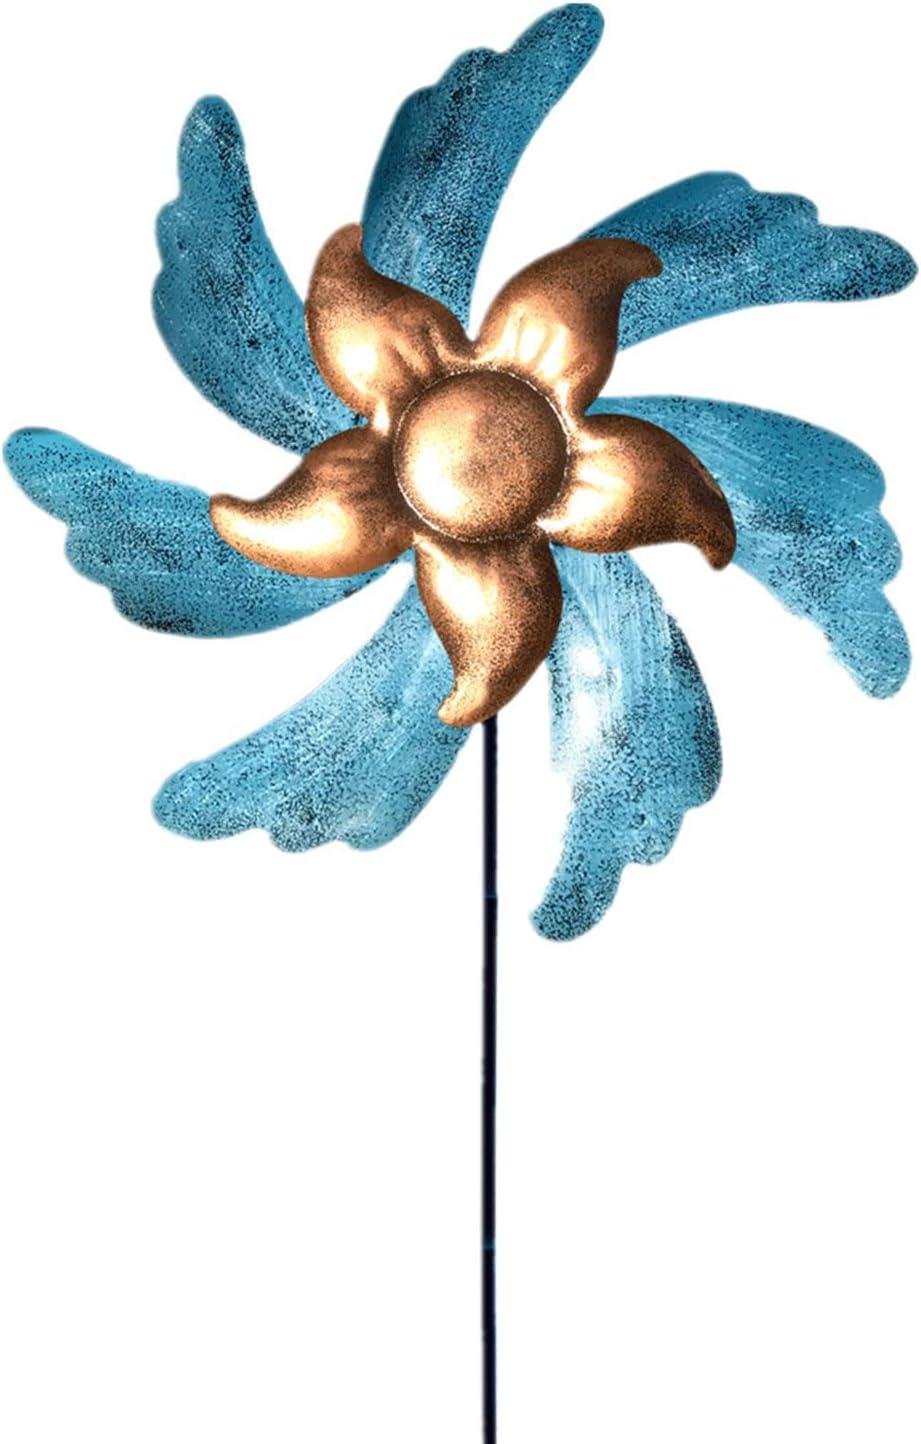 Wind Spinner Outdoor Metal Yard Art Decorations, Metal Wind Sculpture for Lawn & Garden Decor Outdoor